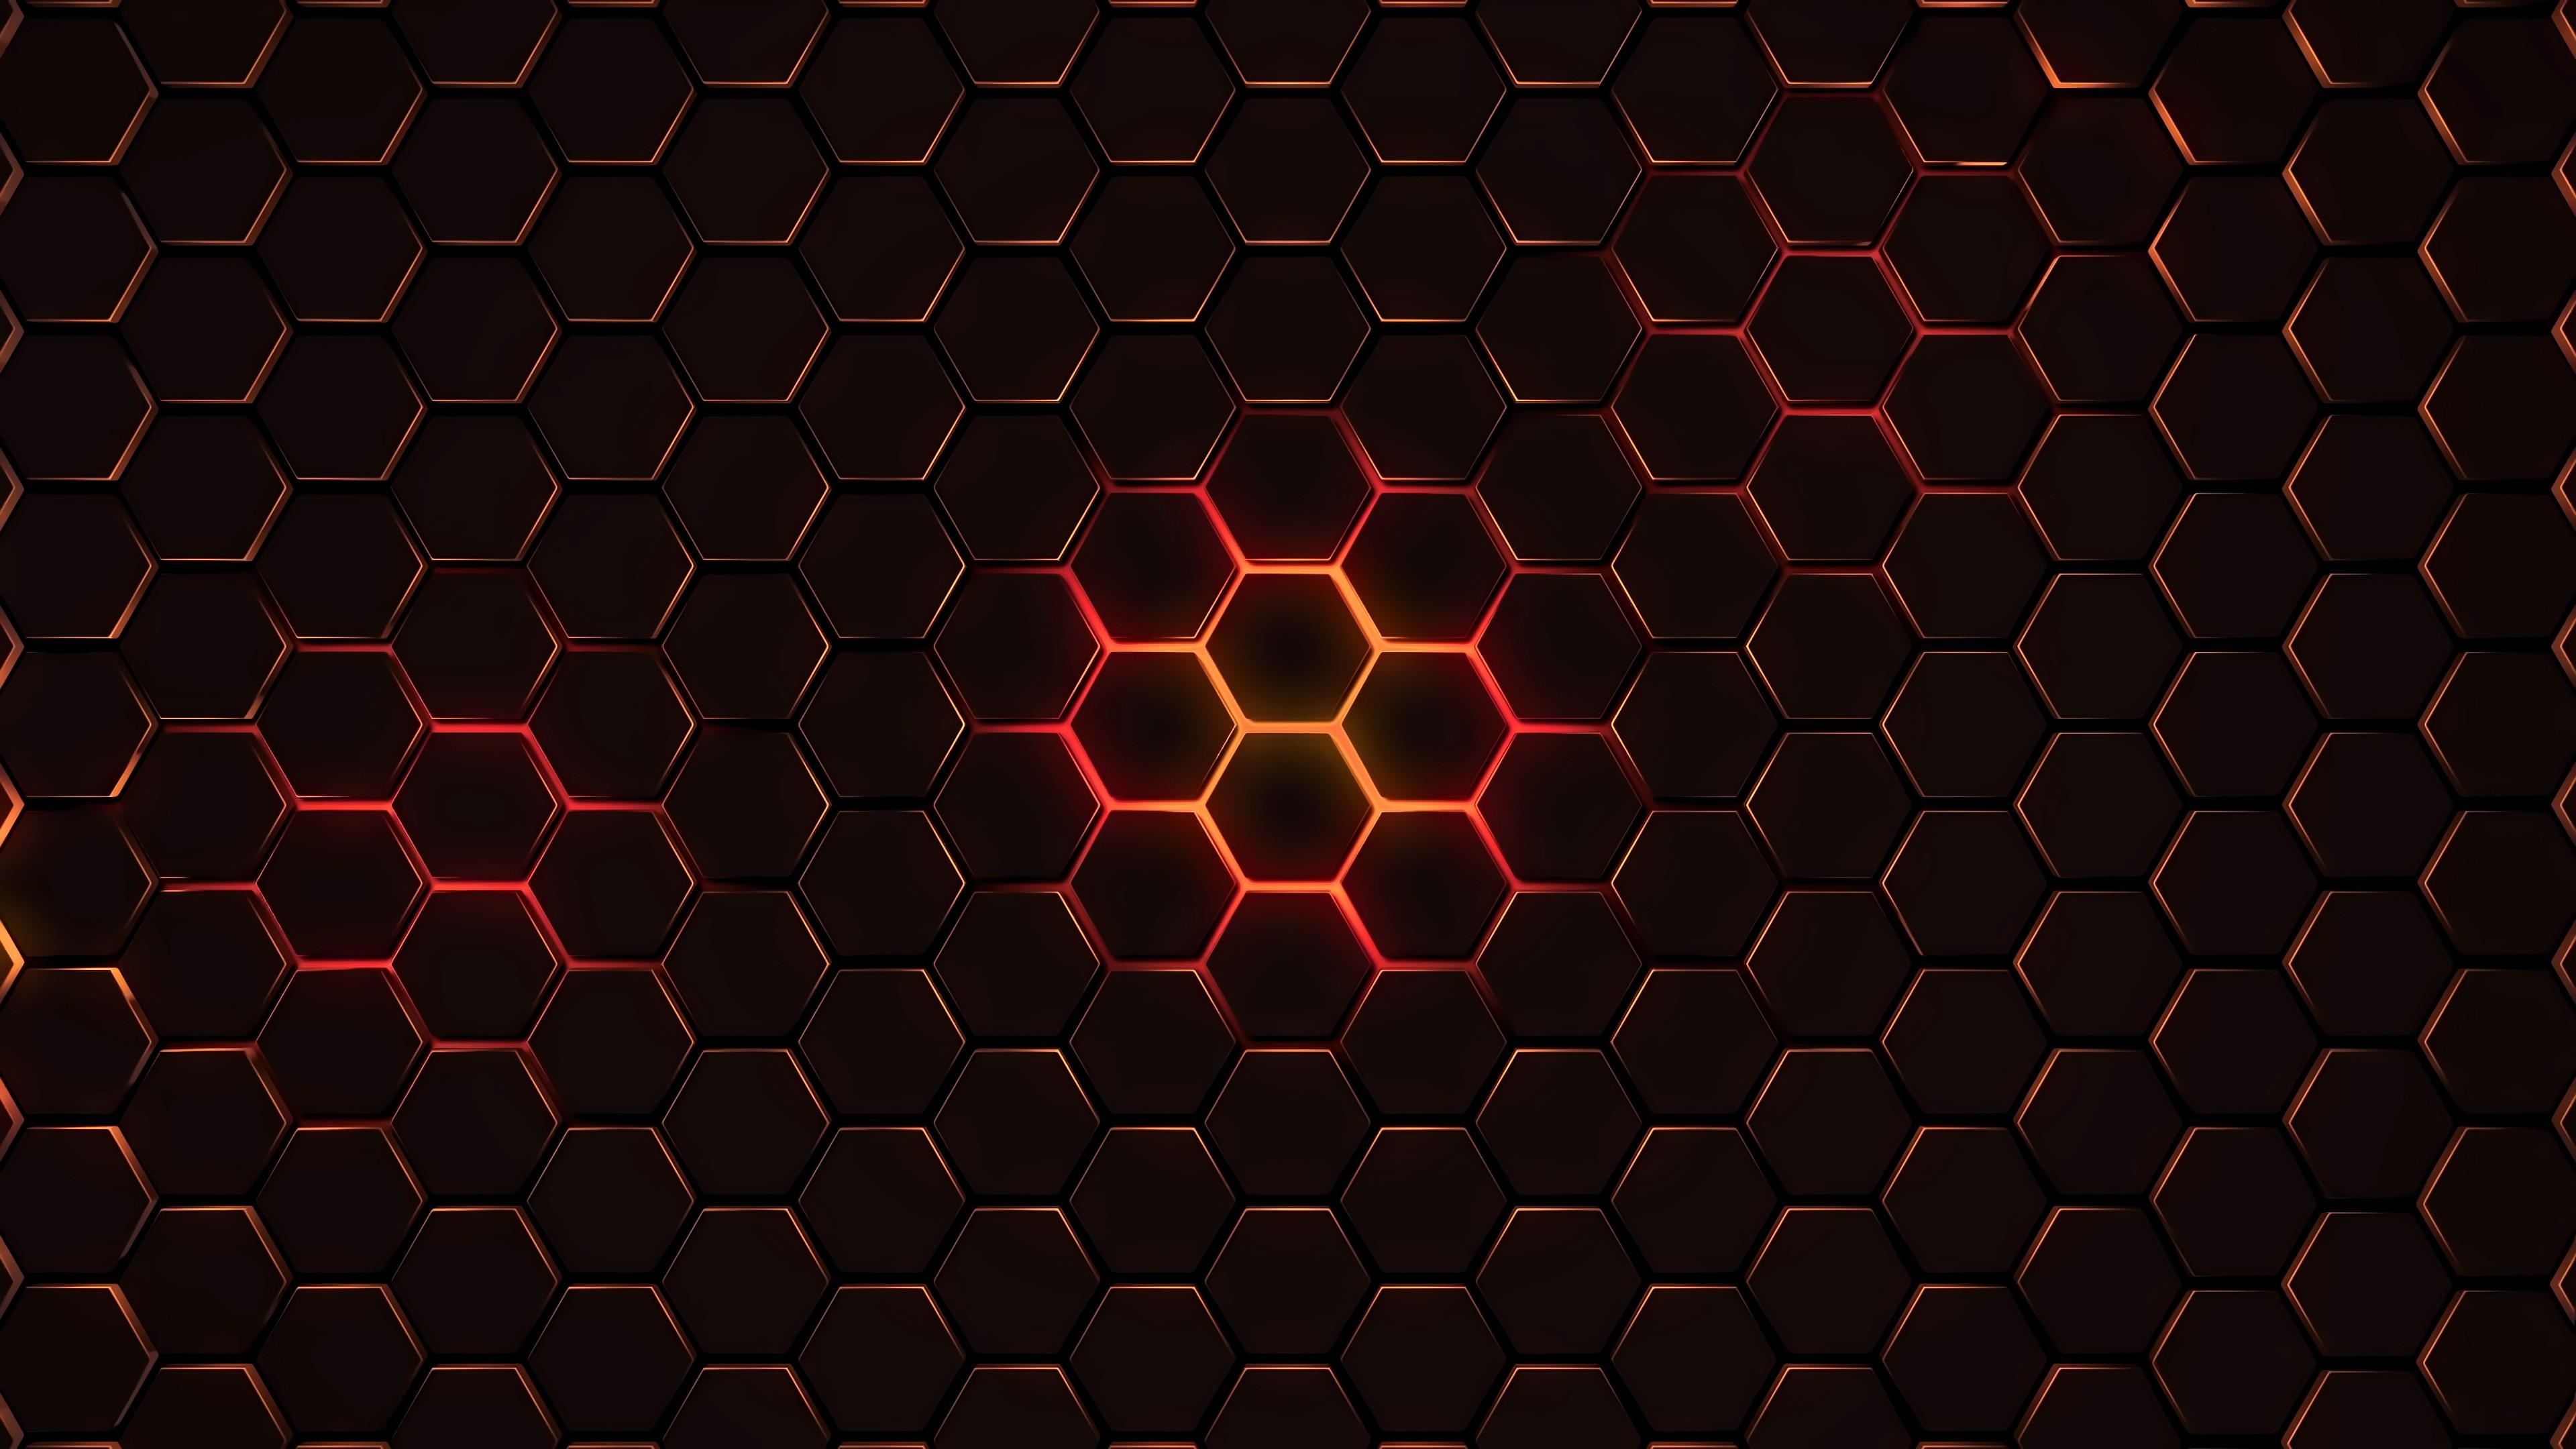 hexagon geometry 4k 1539371001 - Hexagon Geometry 4k - hexagon wallpapers, hd-wallpapers, geometry wallpapers, abstract wallpapers, 4k-wallpapers